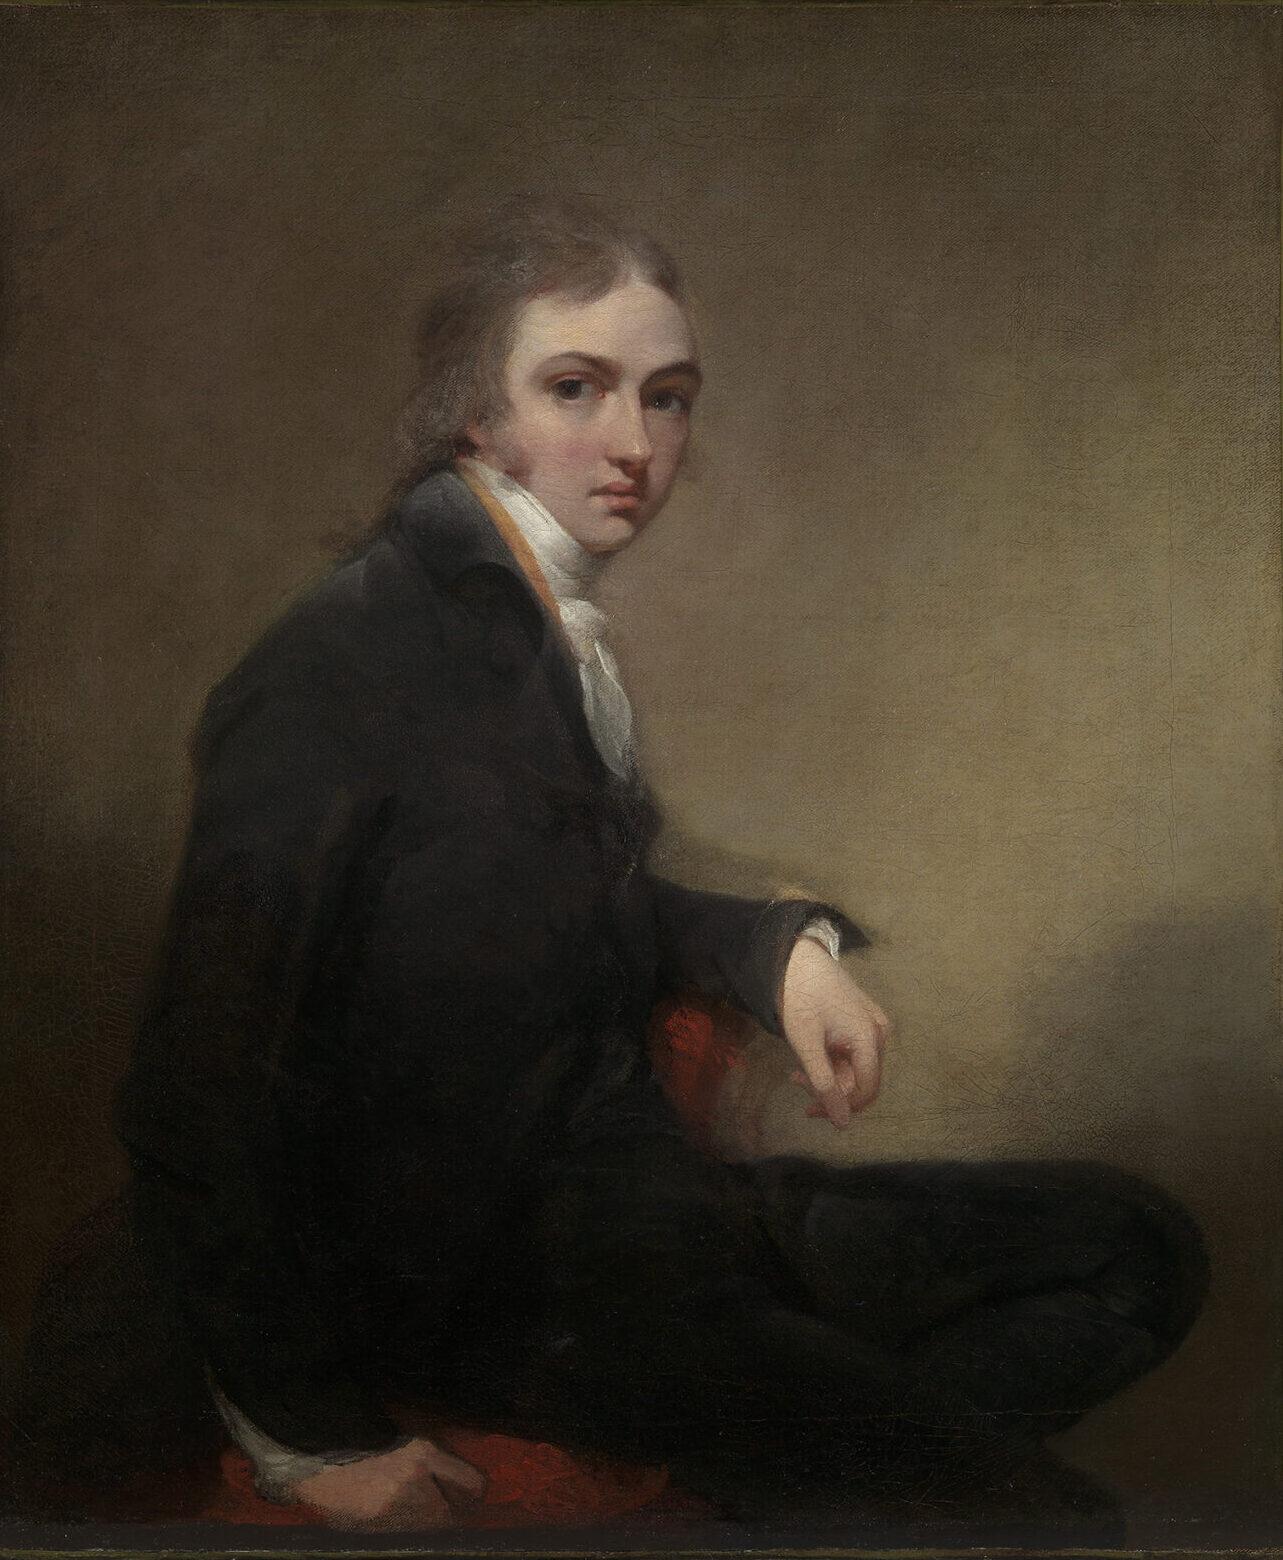 Self-Portrait Oil on canvas, c.1787